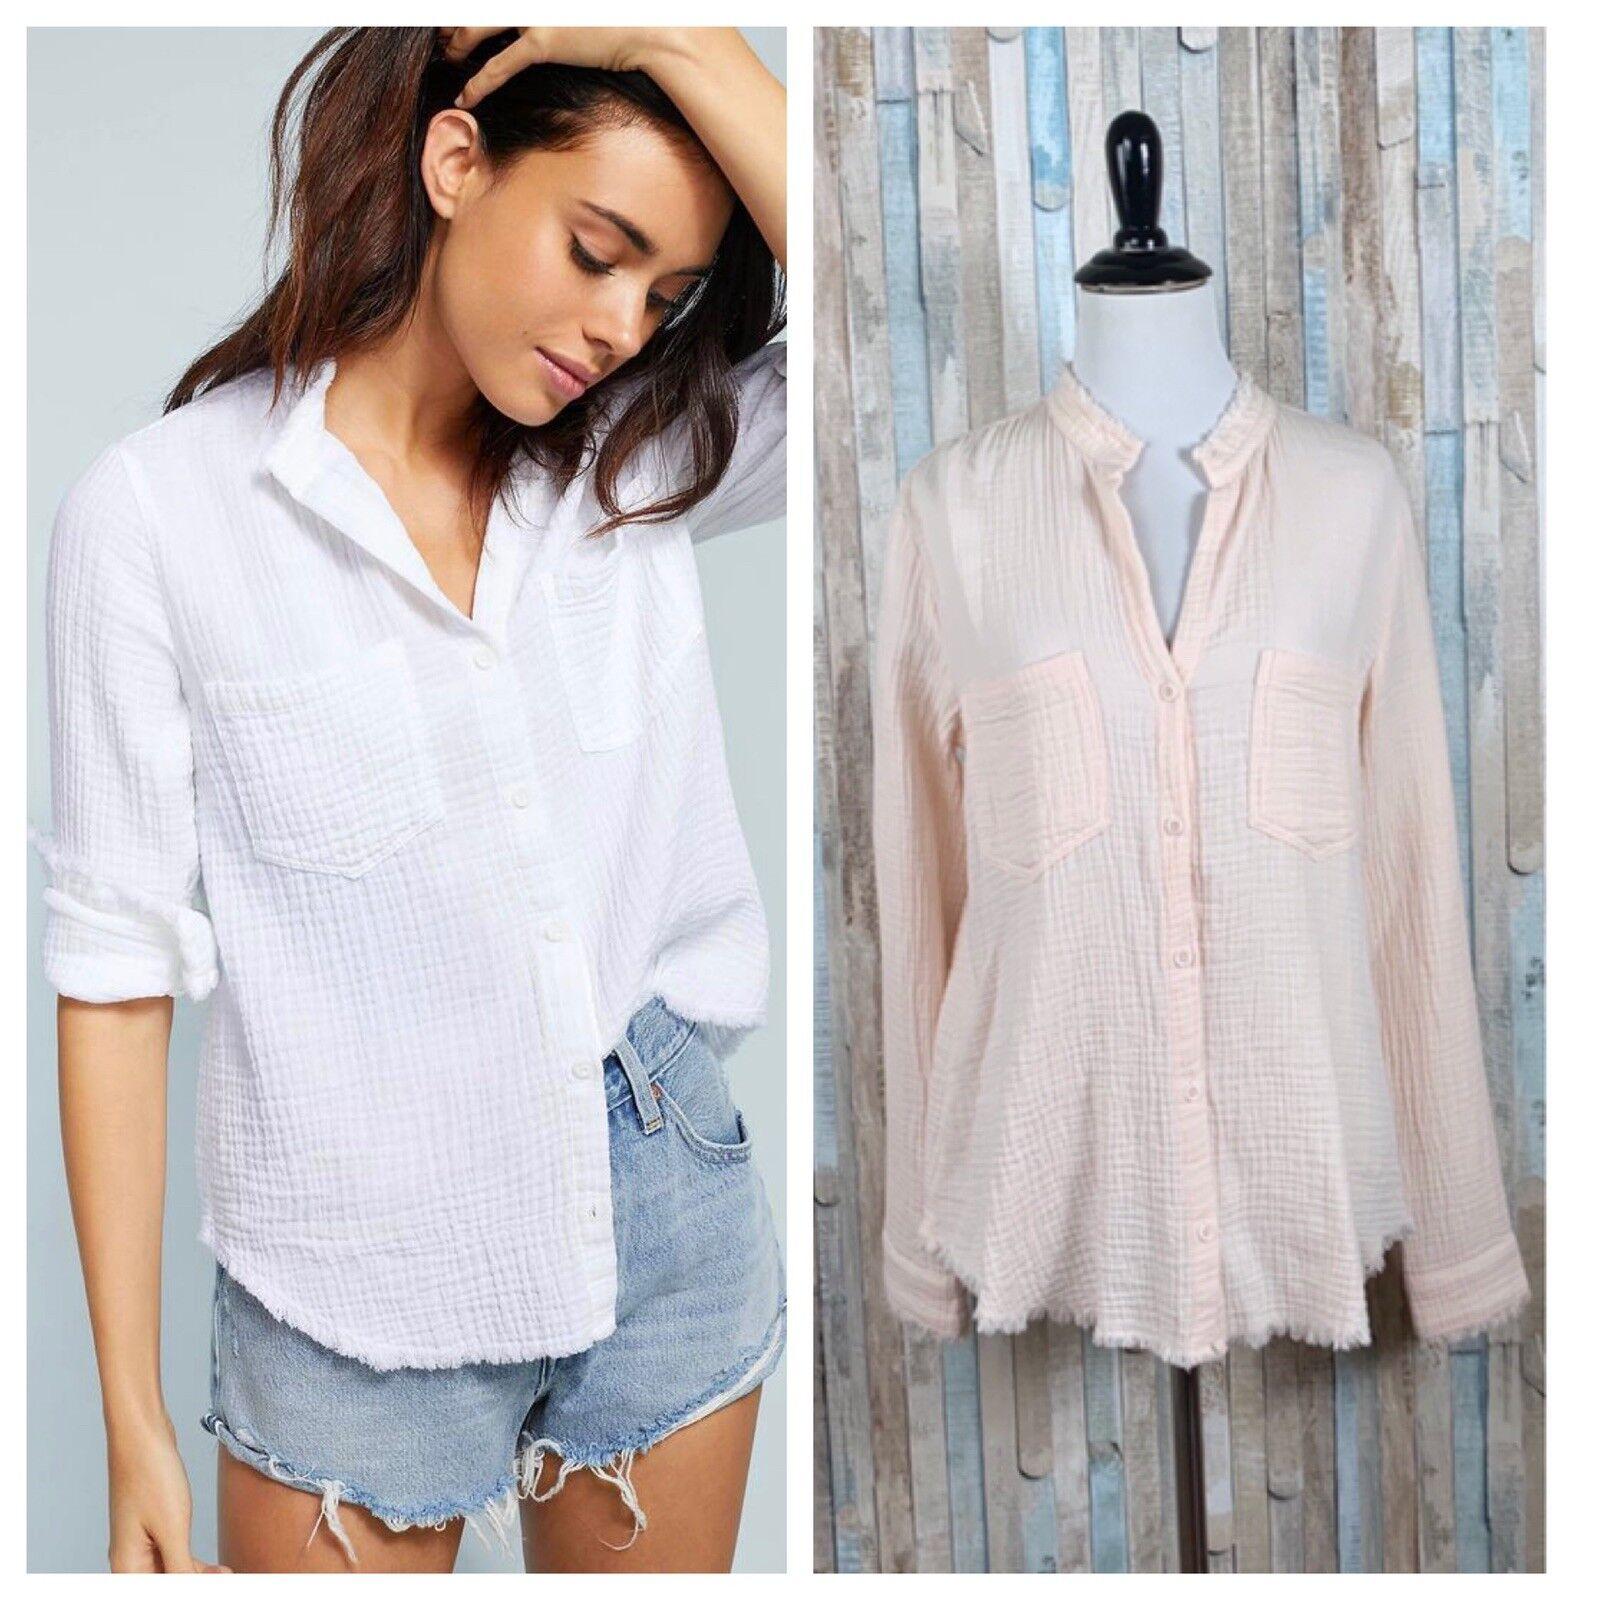 f1b564ba198f Anthropologie XS Cloth Stone Pink Buttondown Top Fringe Crinkled Riley  Shirt nnzwqb21390-Tops & Shirts